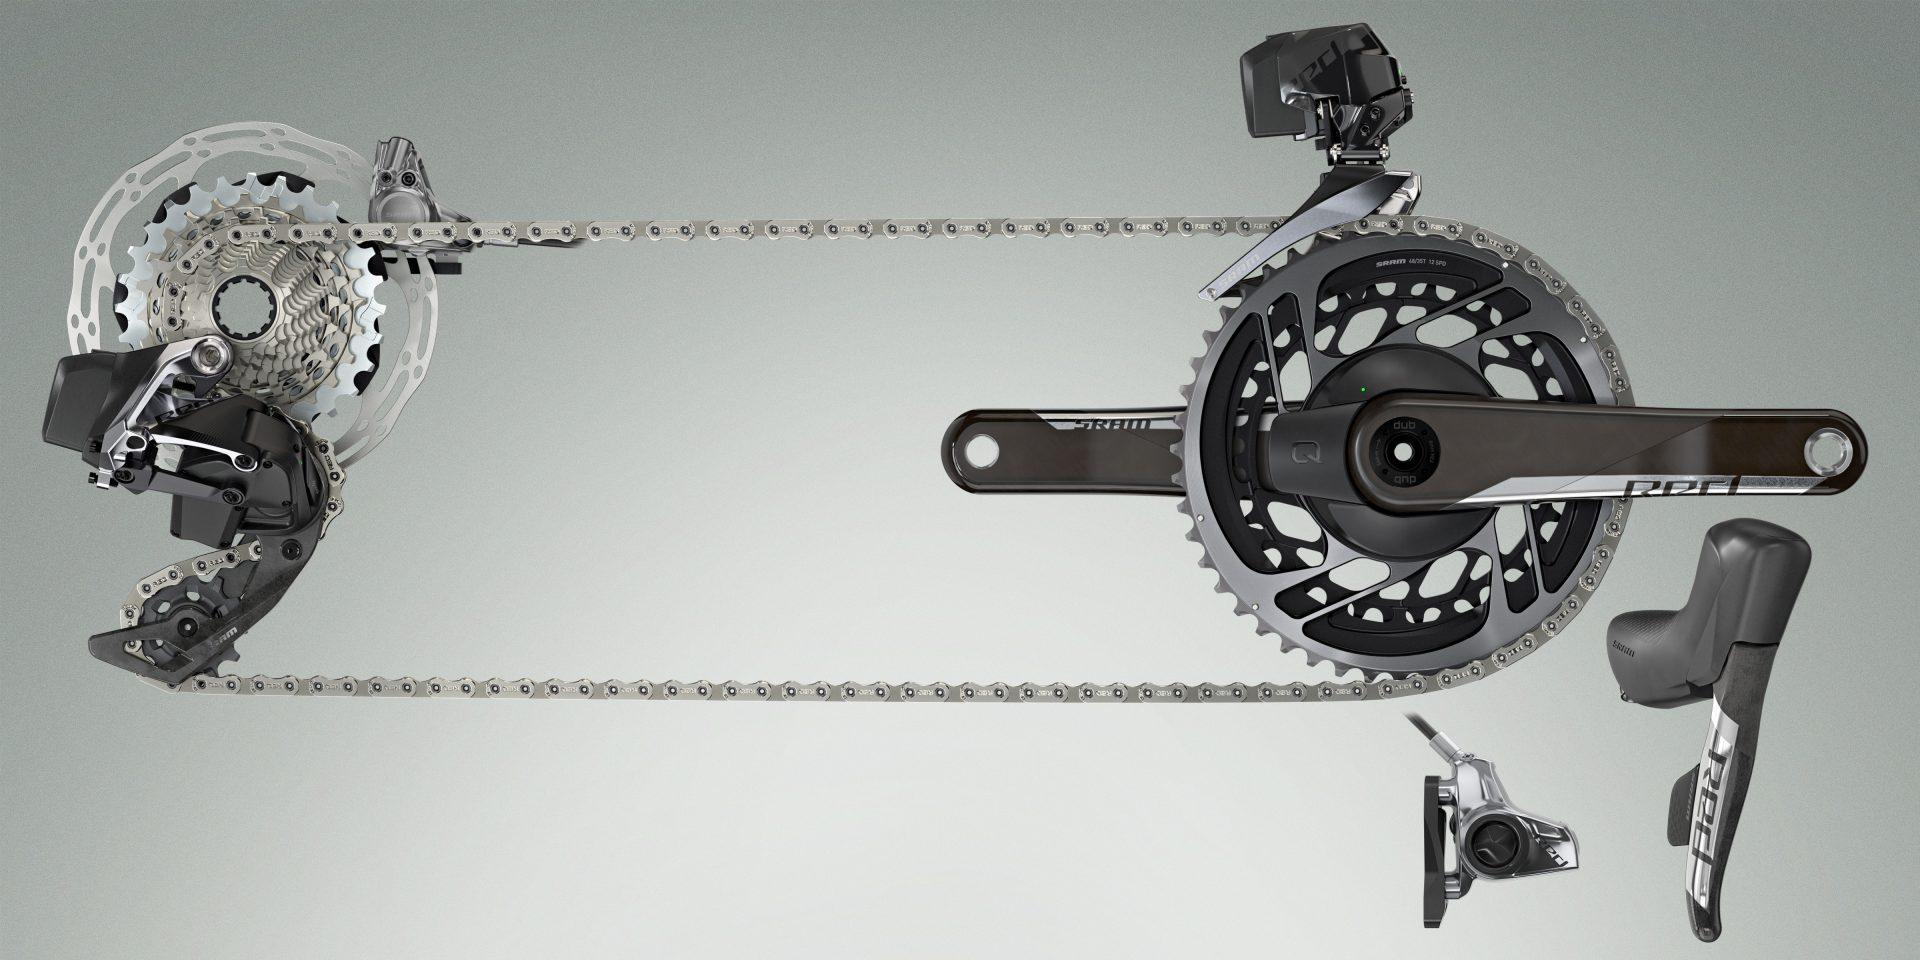 SRAM Launches RED eTap AXS 12-speed Wireless Road Bike Groupset 29